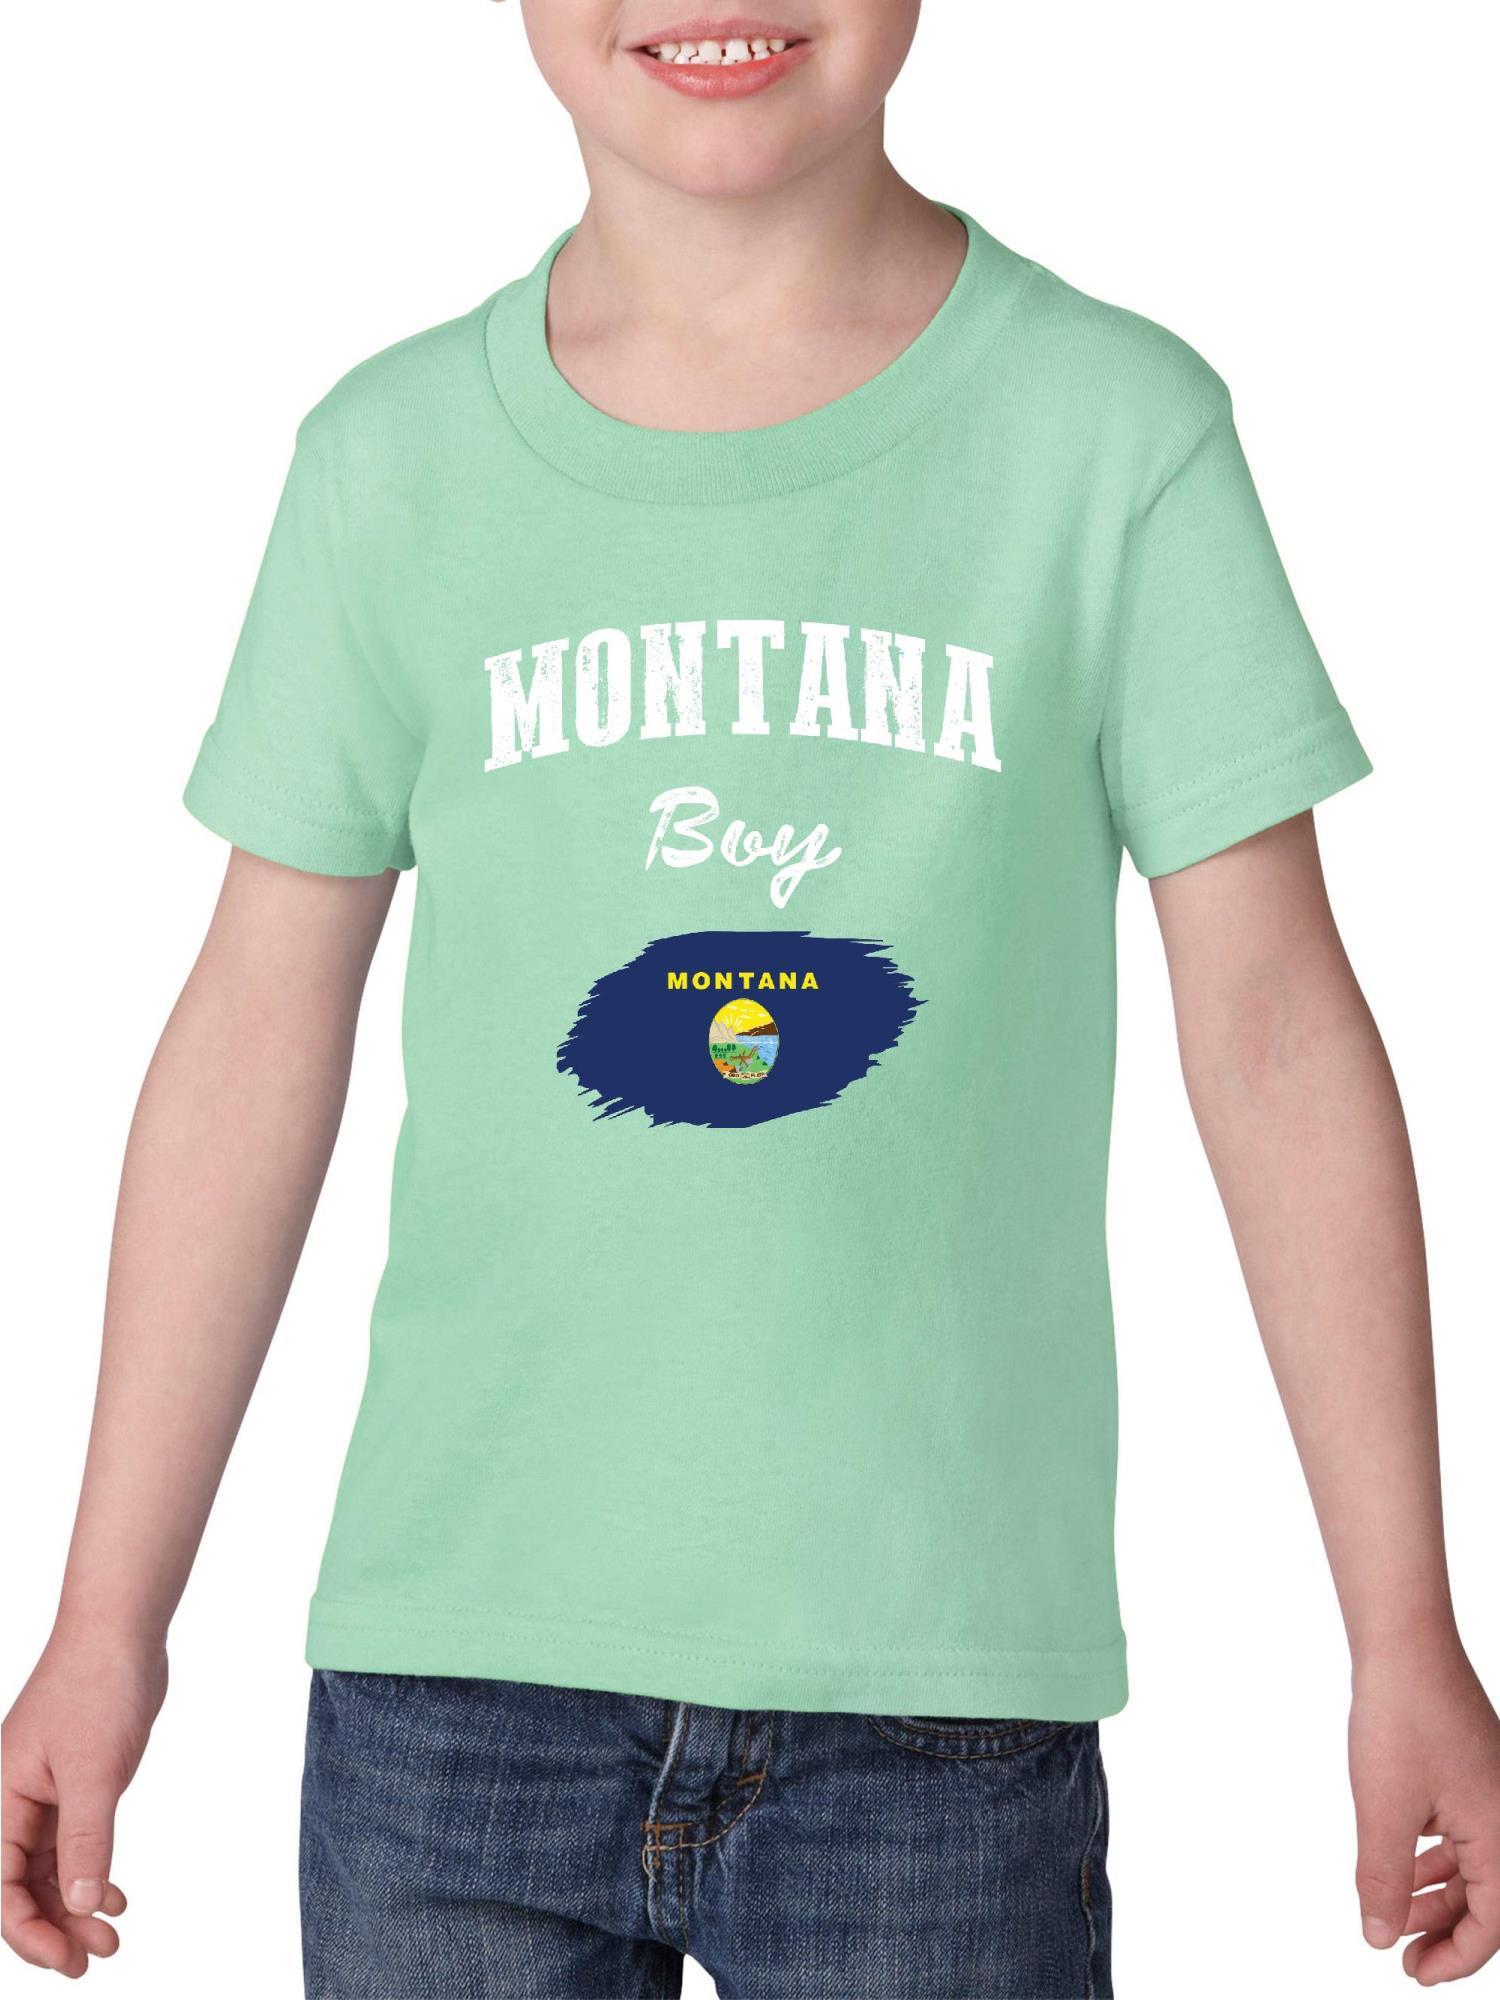 Montana Boy Heavy Cotton Toddler Kids T-Shirt Tee Clothing